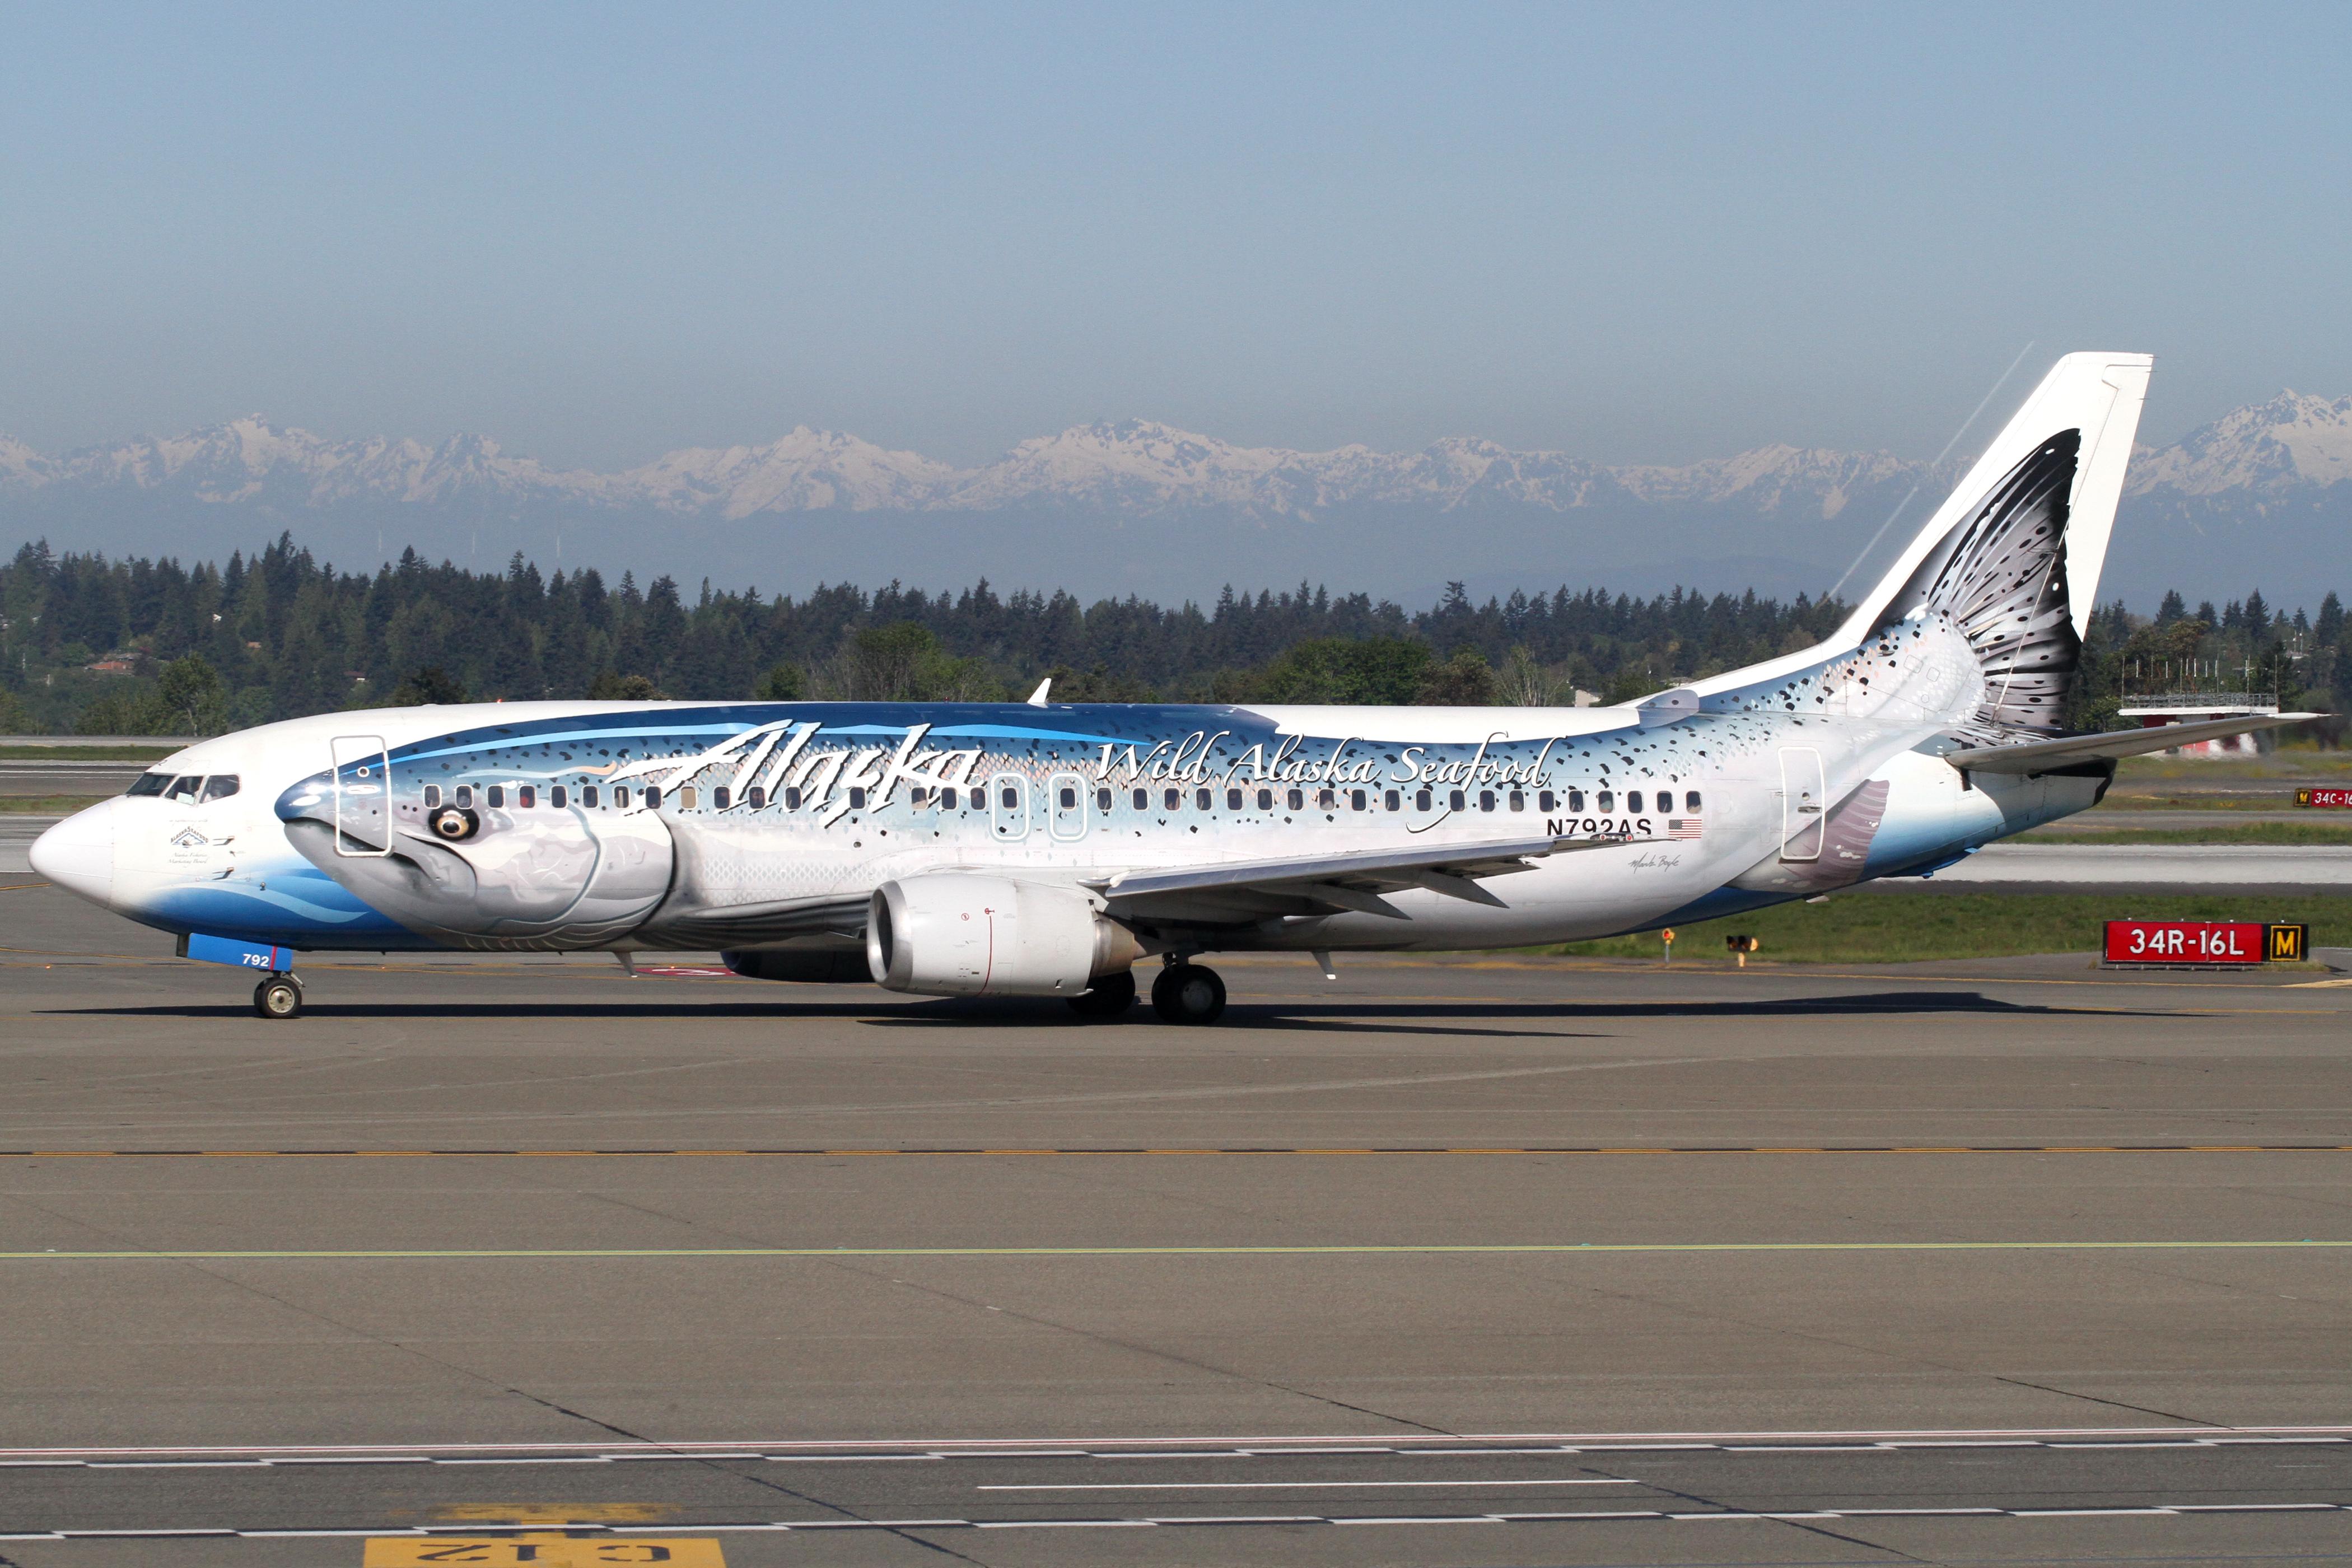 Alaskaair Com Best Images Collections Hd For Gadget